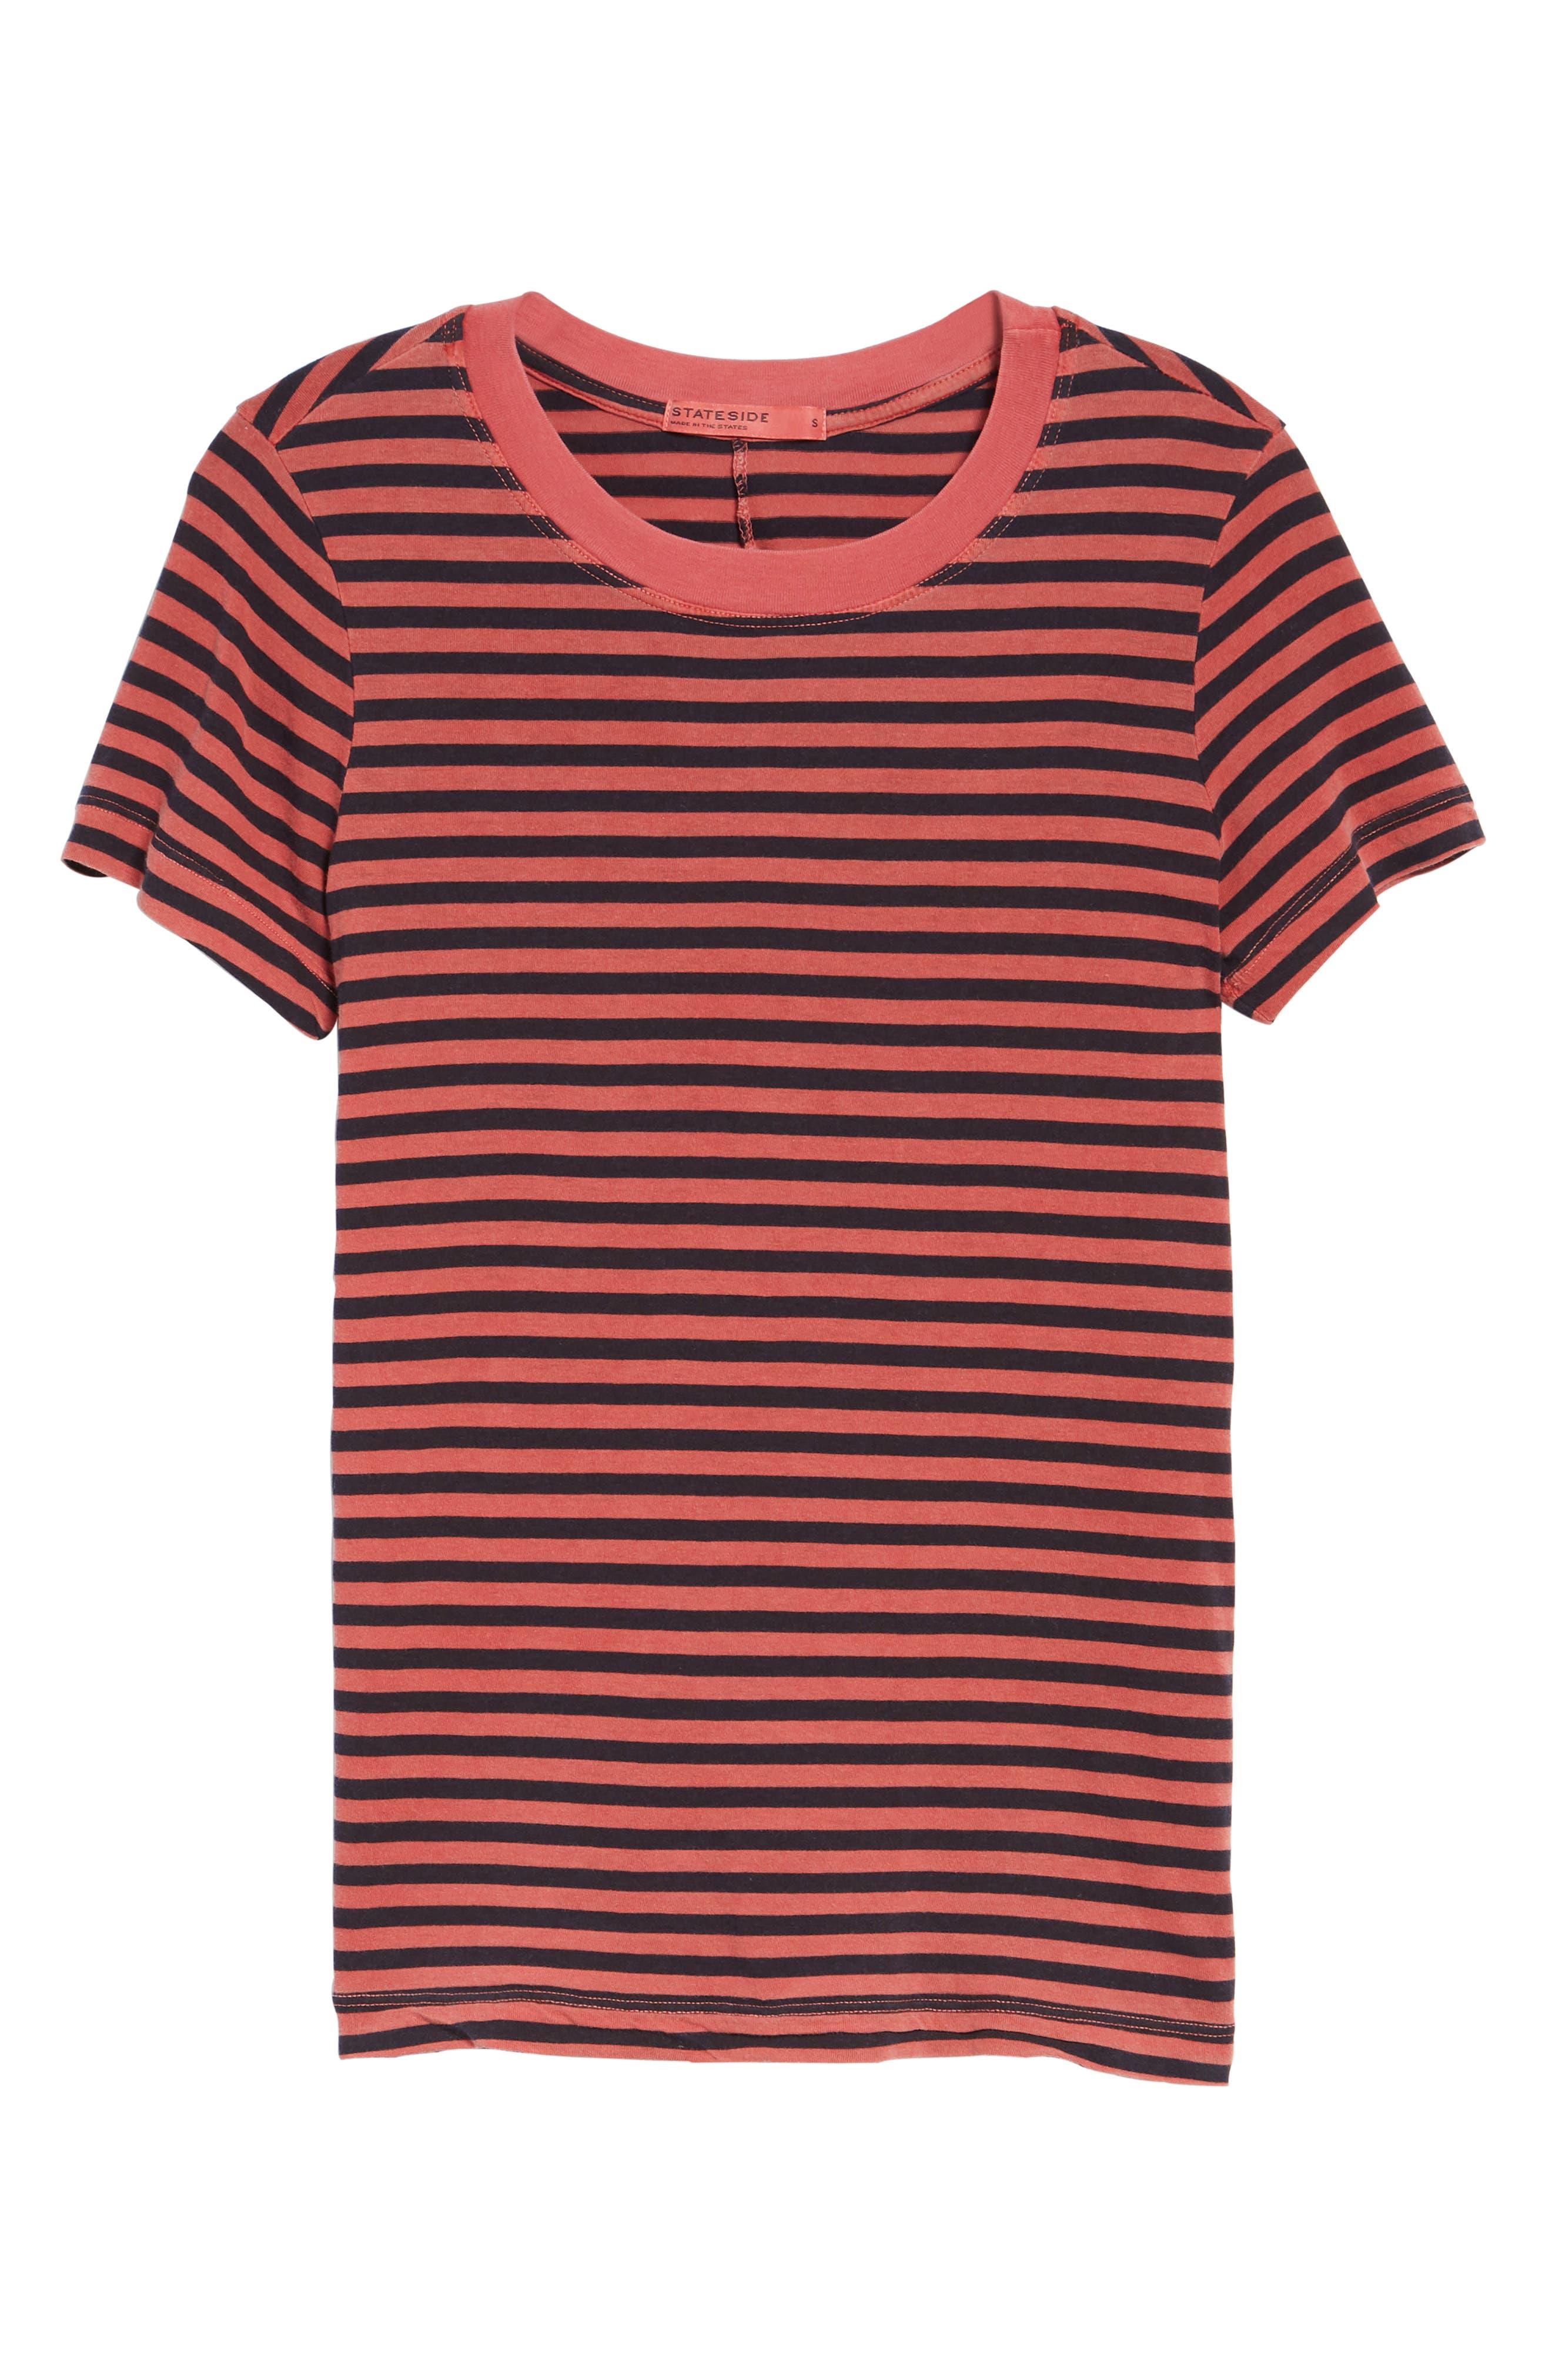 Stripe Cotton Boy Tee,                             Alternate thumbnail 6, color,                             Chili